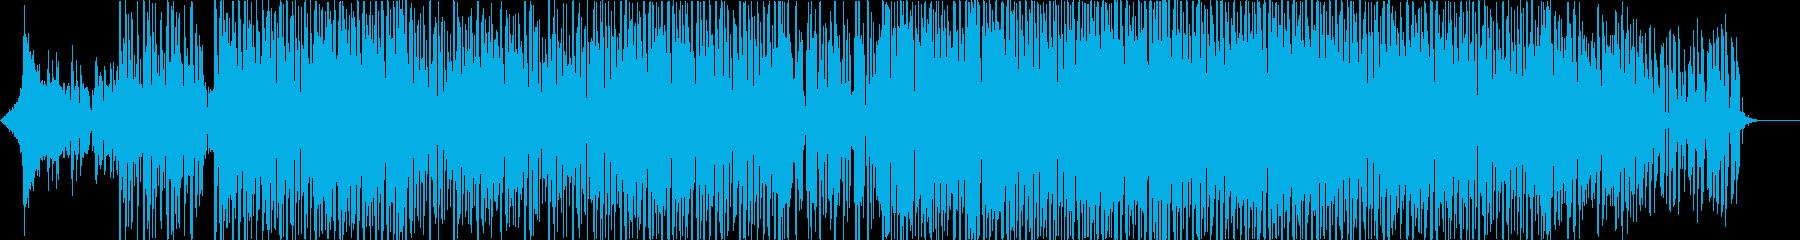 YouTube/可愛い/EDM/OP風の再生済みの波形